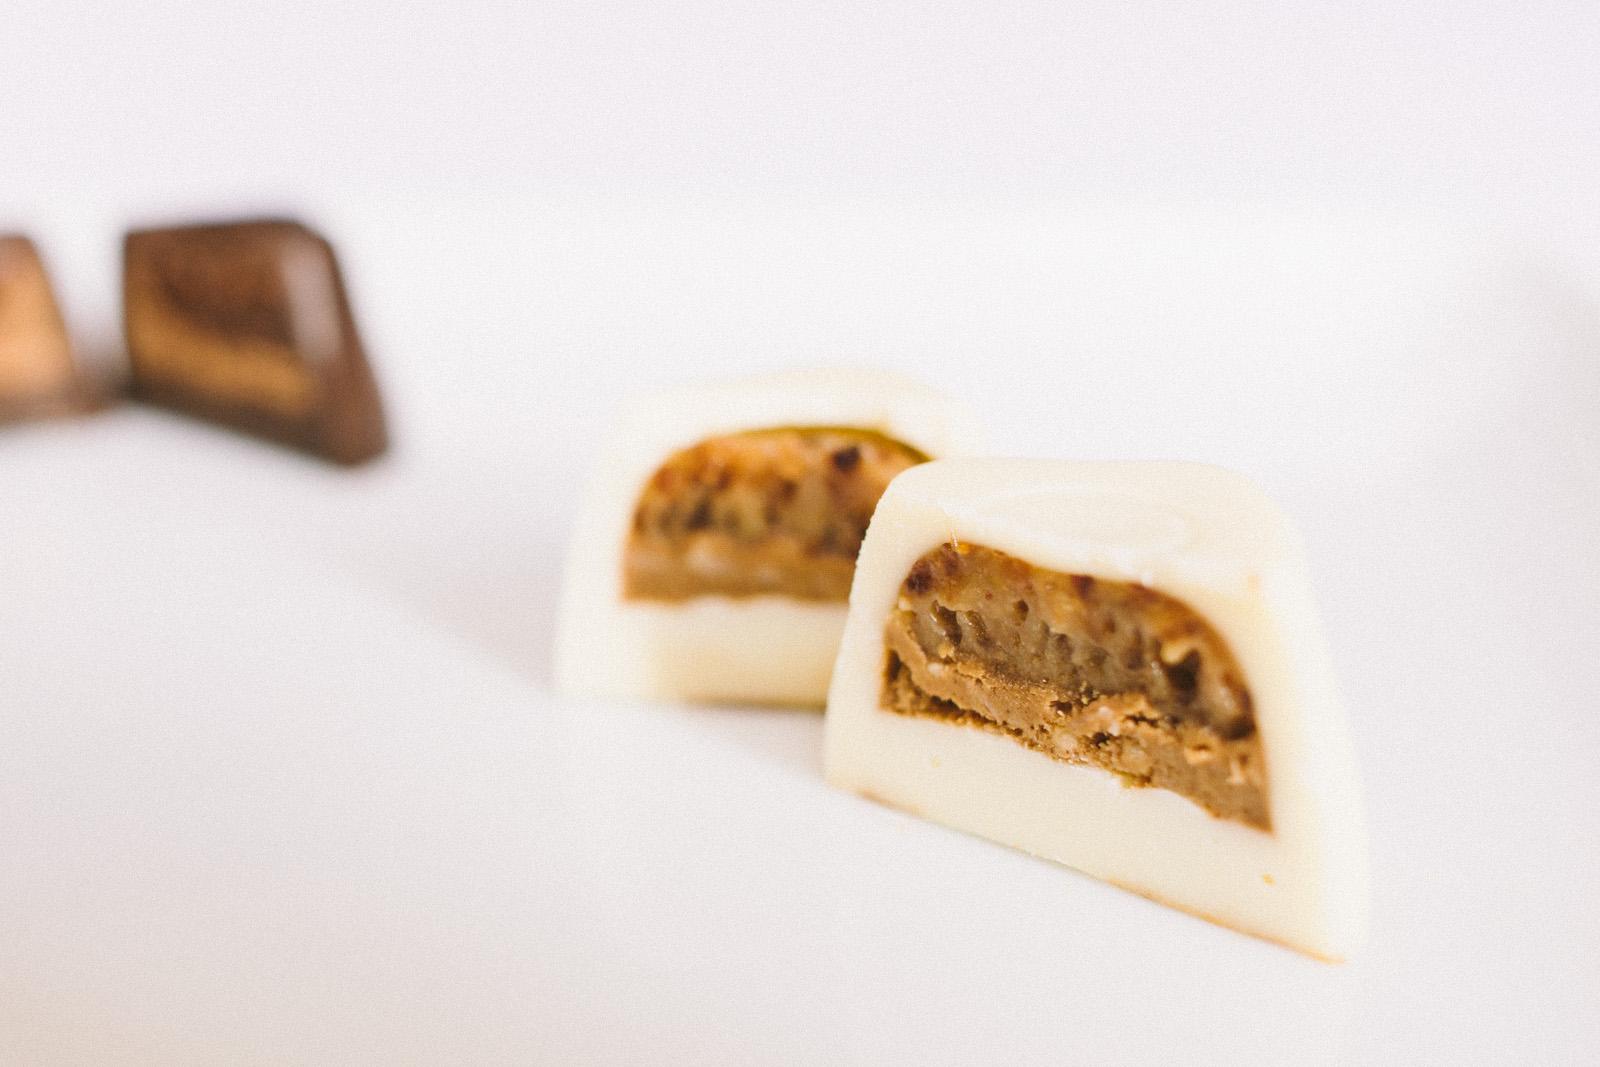 that-food-cray-godiva-chocolate-2013-mid-autumn-festival-mooncakes-43